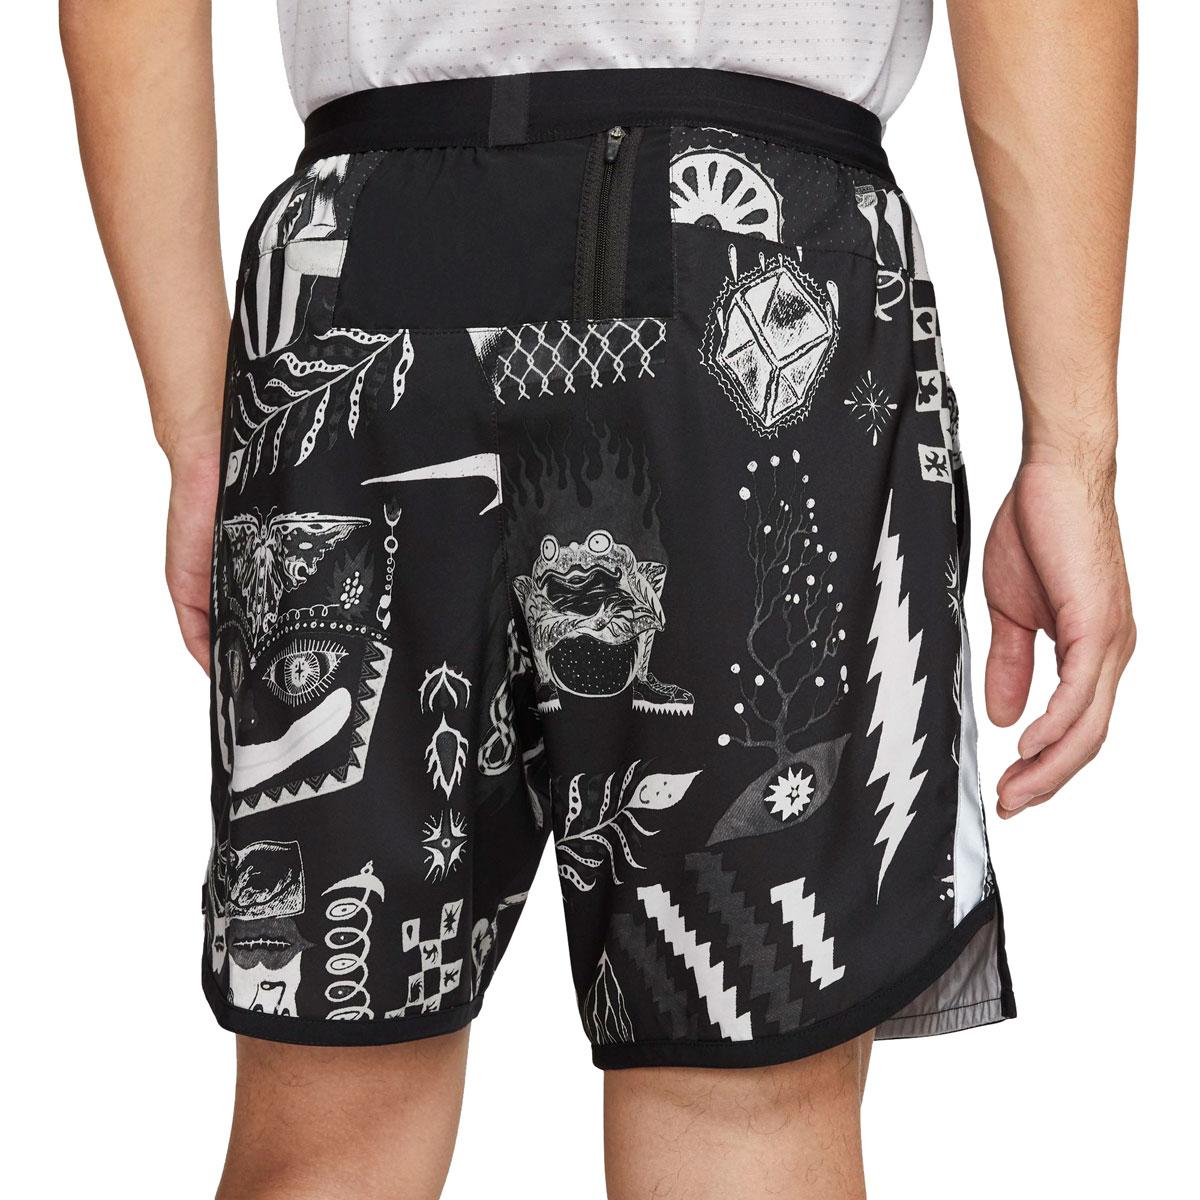 Men's Nike Running Wild Flex Shorts, , large, image 2